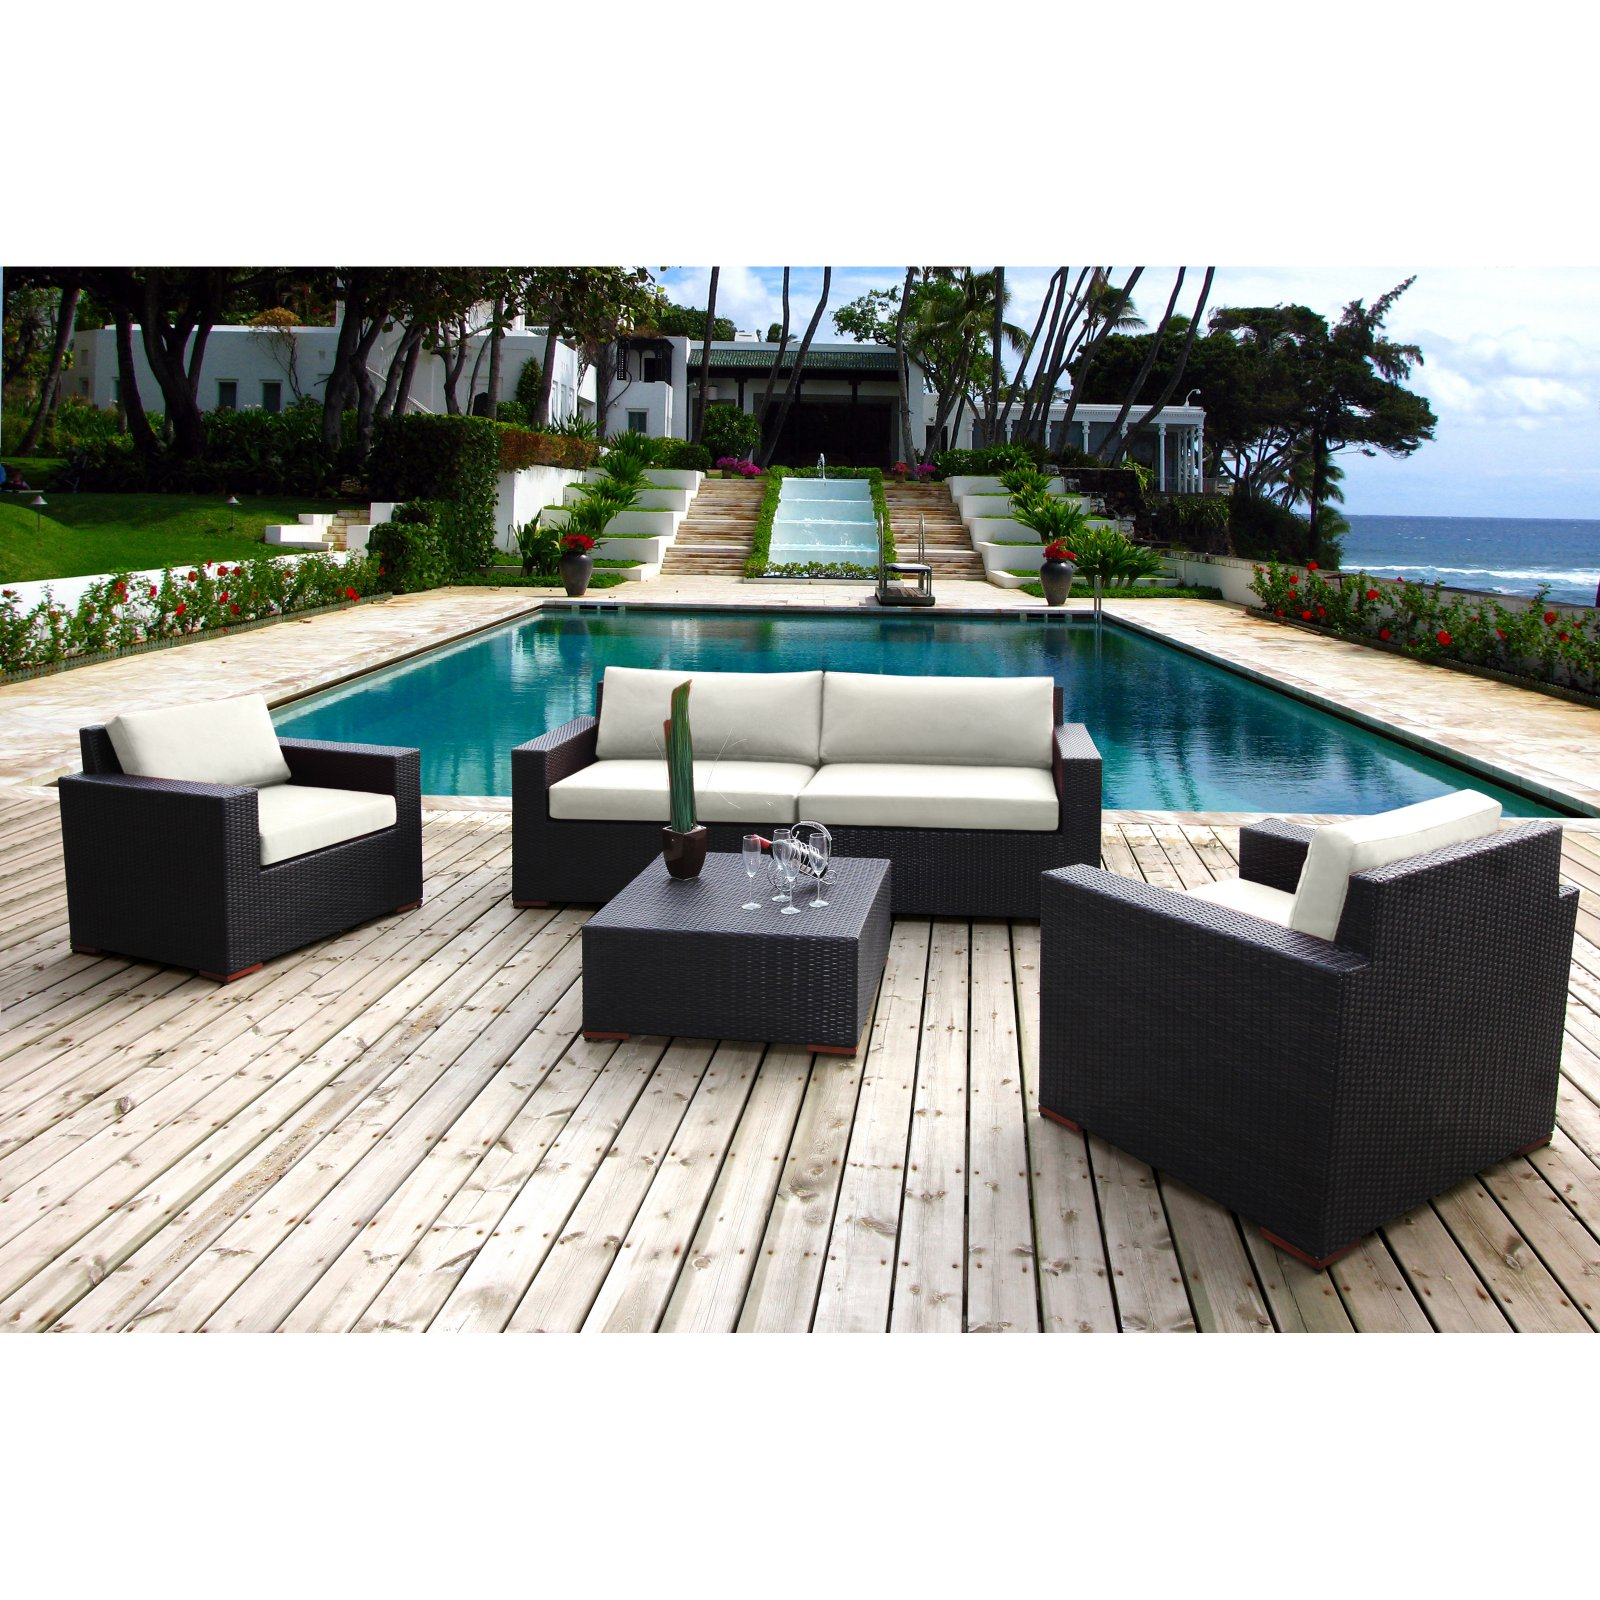 Bellini Home and Gardens Primland Wicker 5 Piece Patio Deep Seating Sofa Conversation Set, Silver